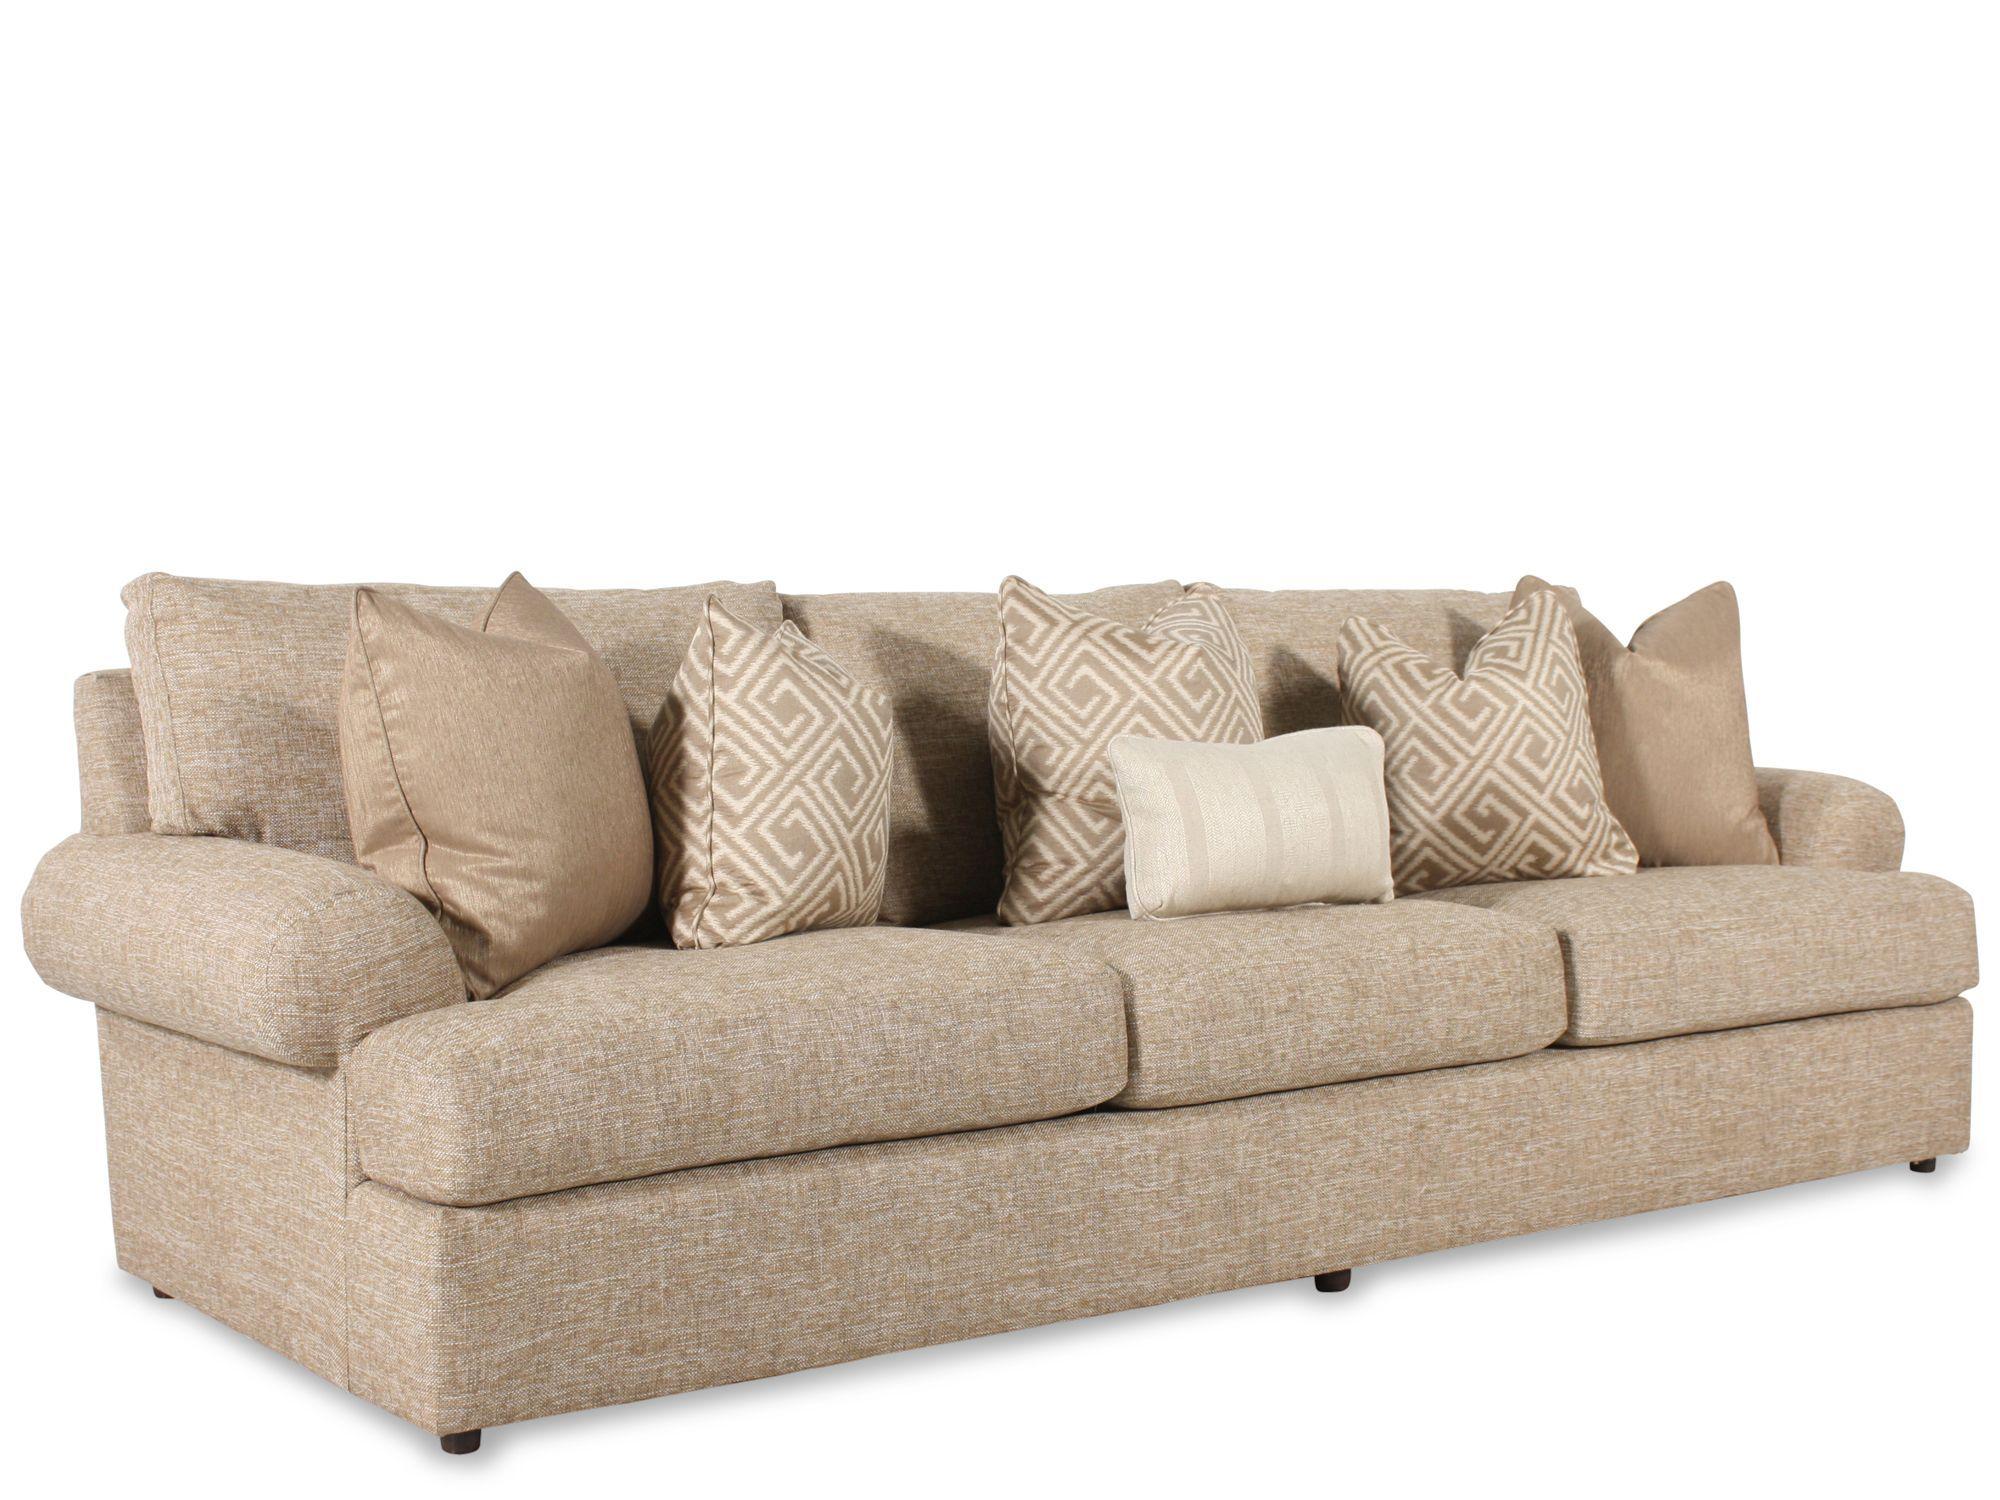 Marvelous Bernhardt Andrew Sofa Interior Elements Sofa Living Interior Design Ideas Clesiryabchikinfo